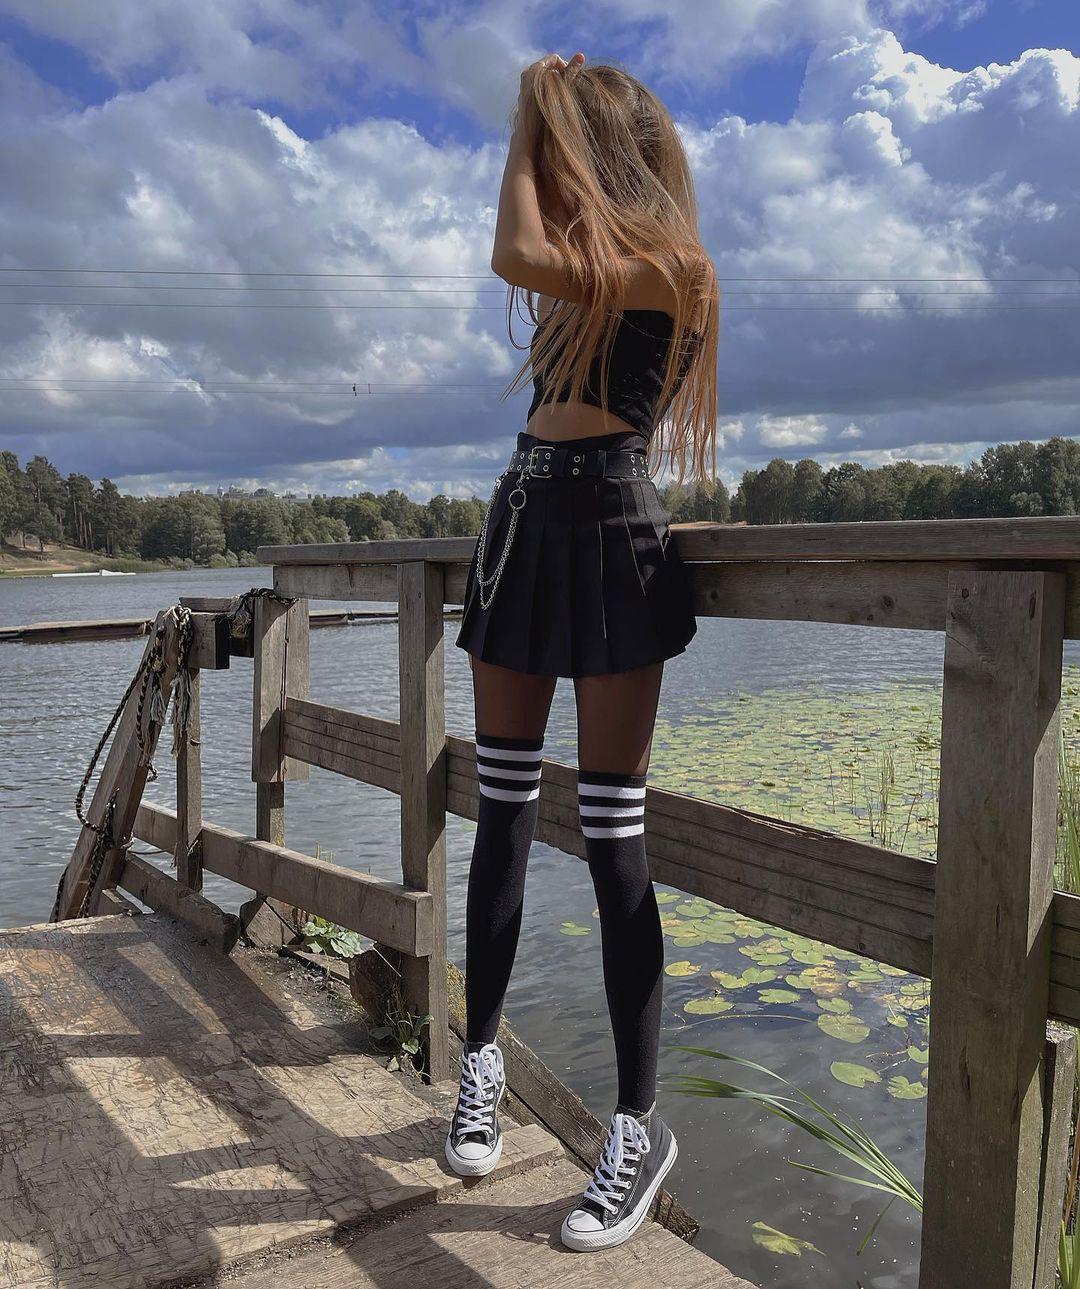 Ksenia-Angela-Wallpapers-Insta-Fit-Bio-9